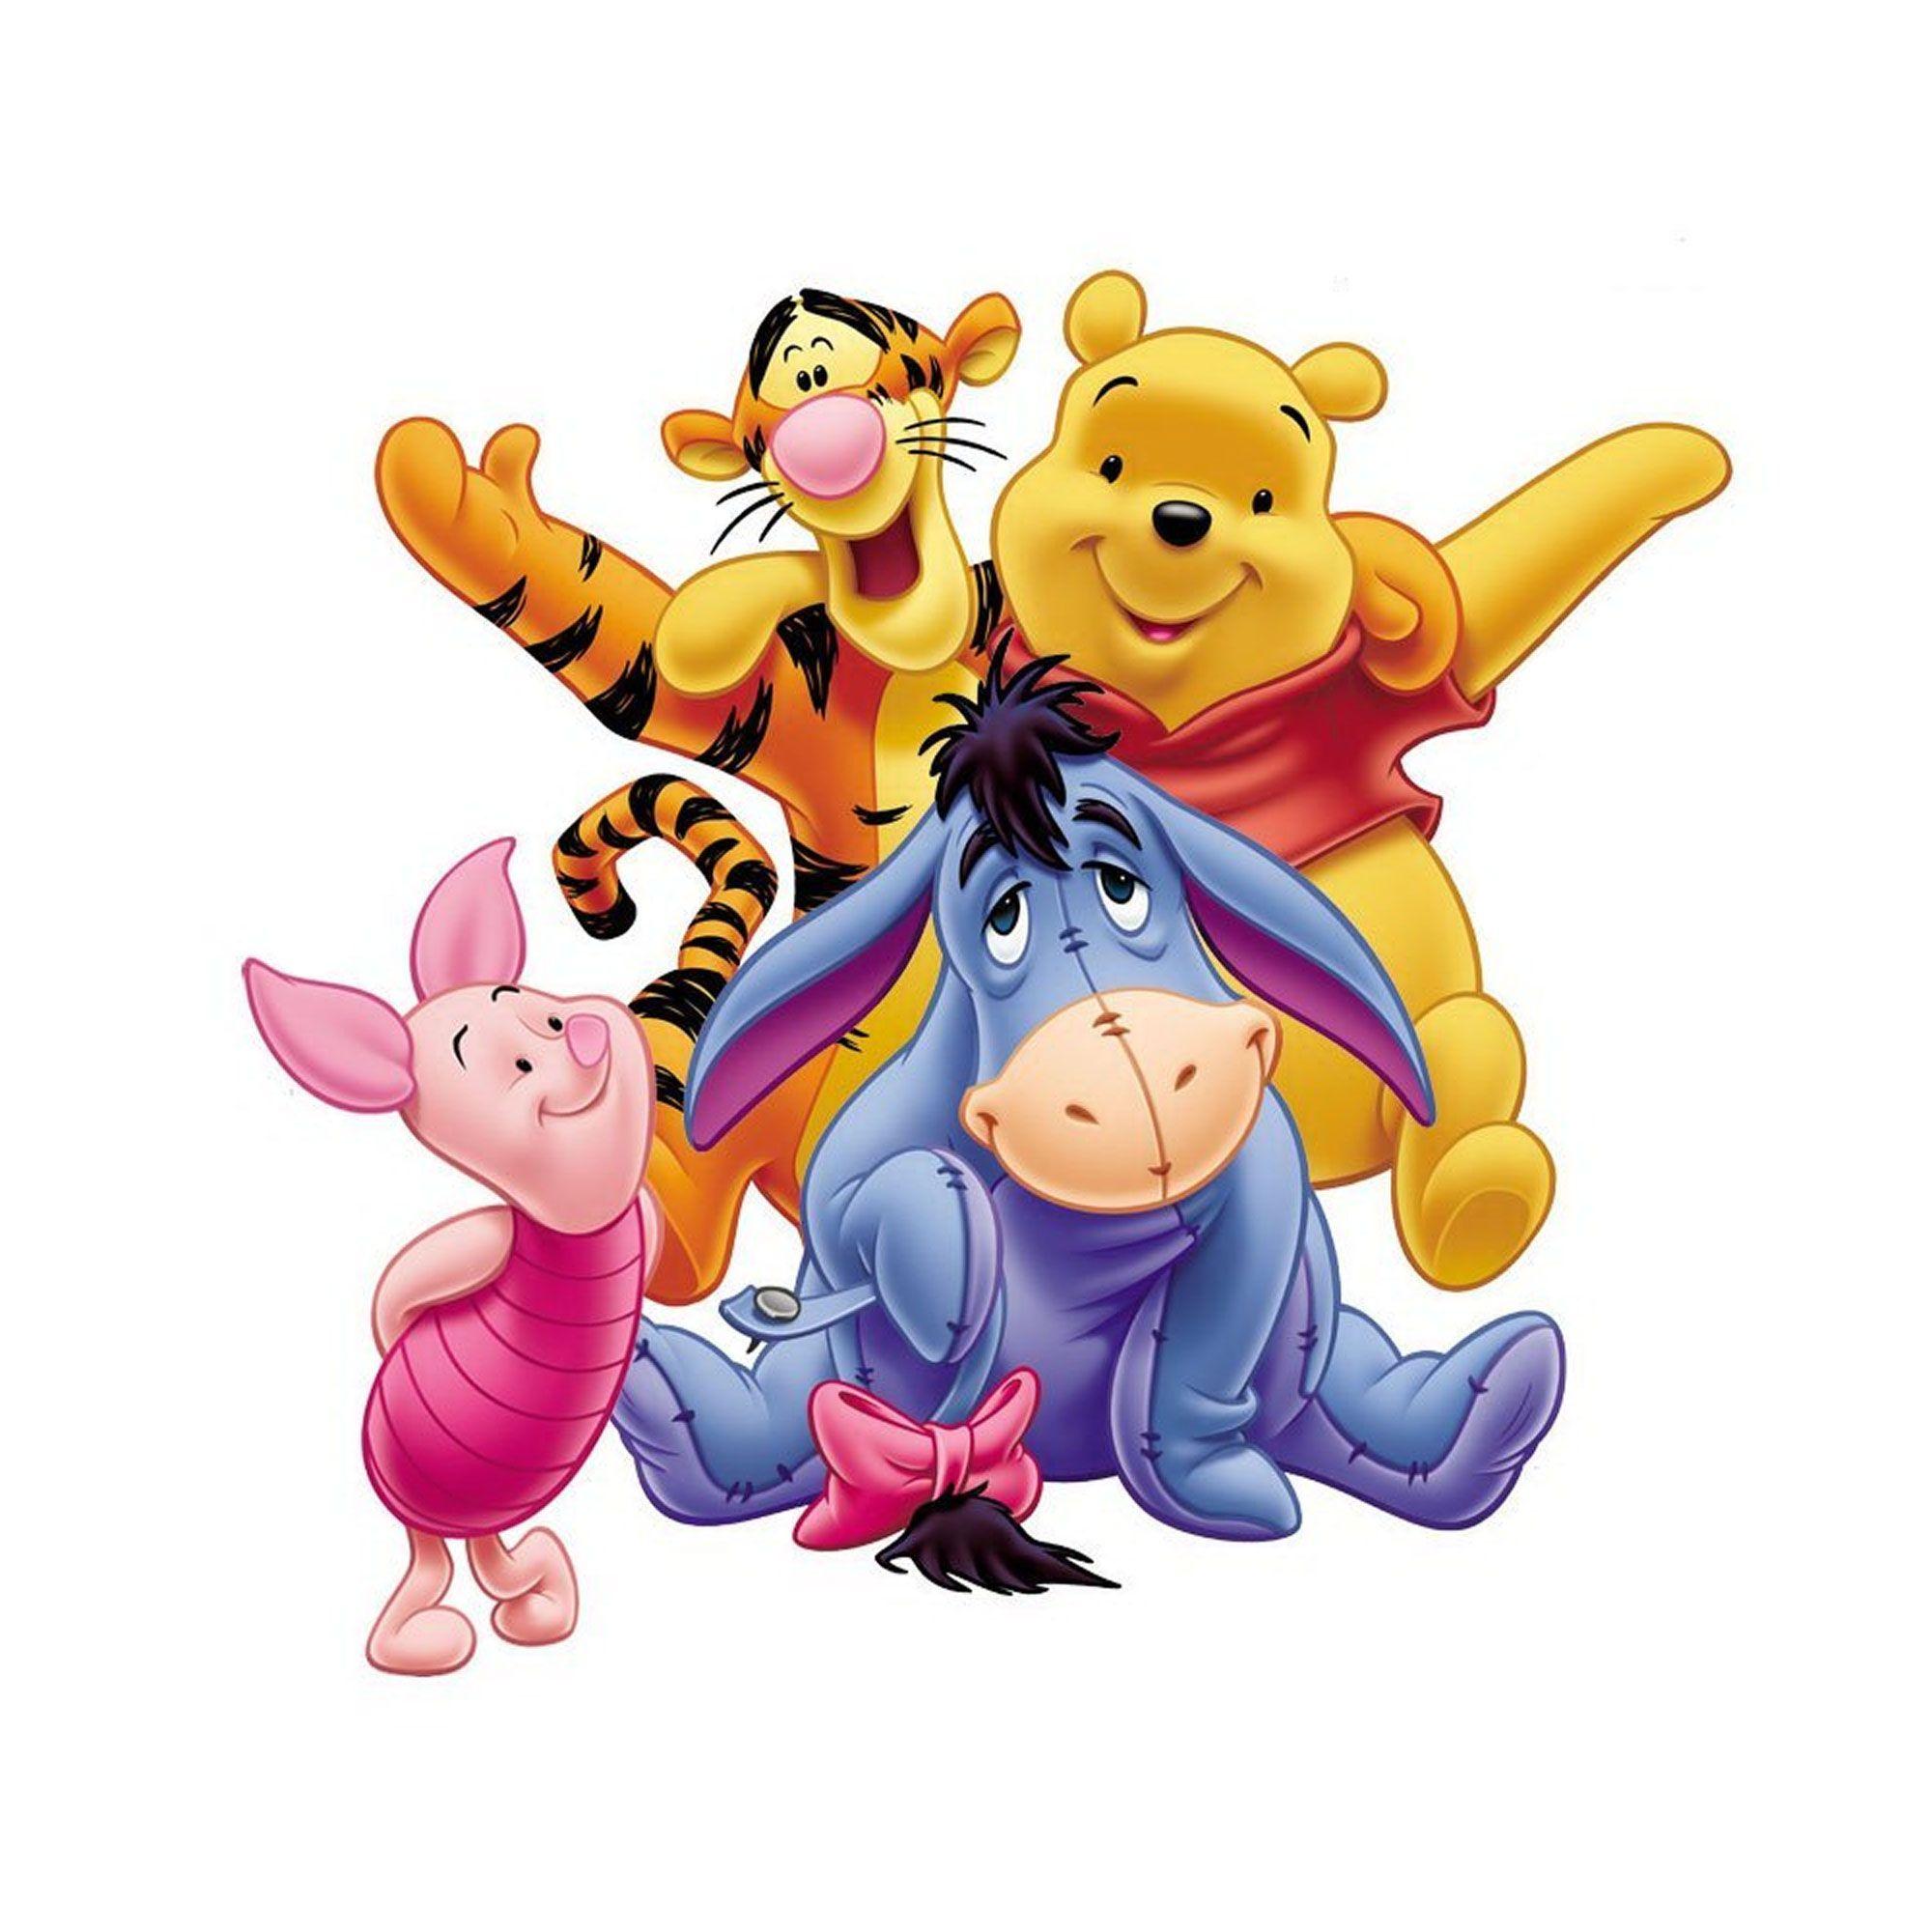 2000x2000 Pin By Sz. On Winnie The Pooh (Friends)